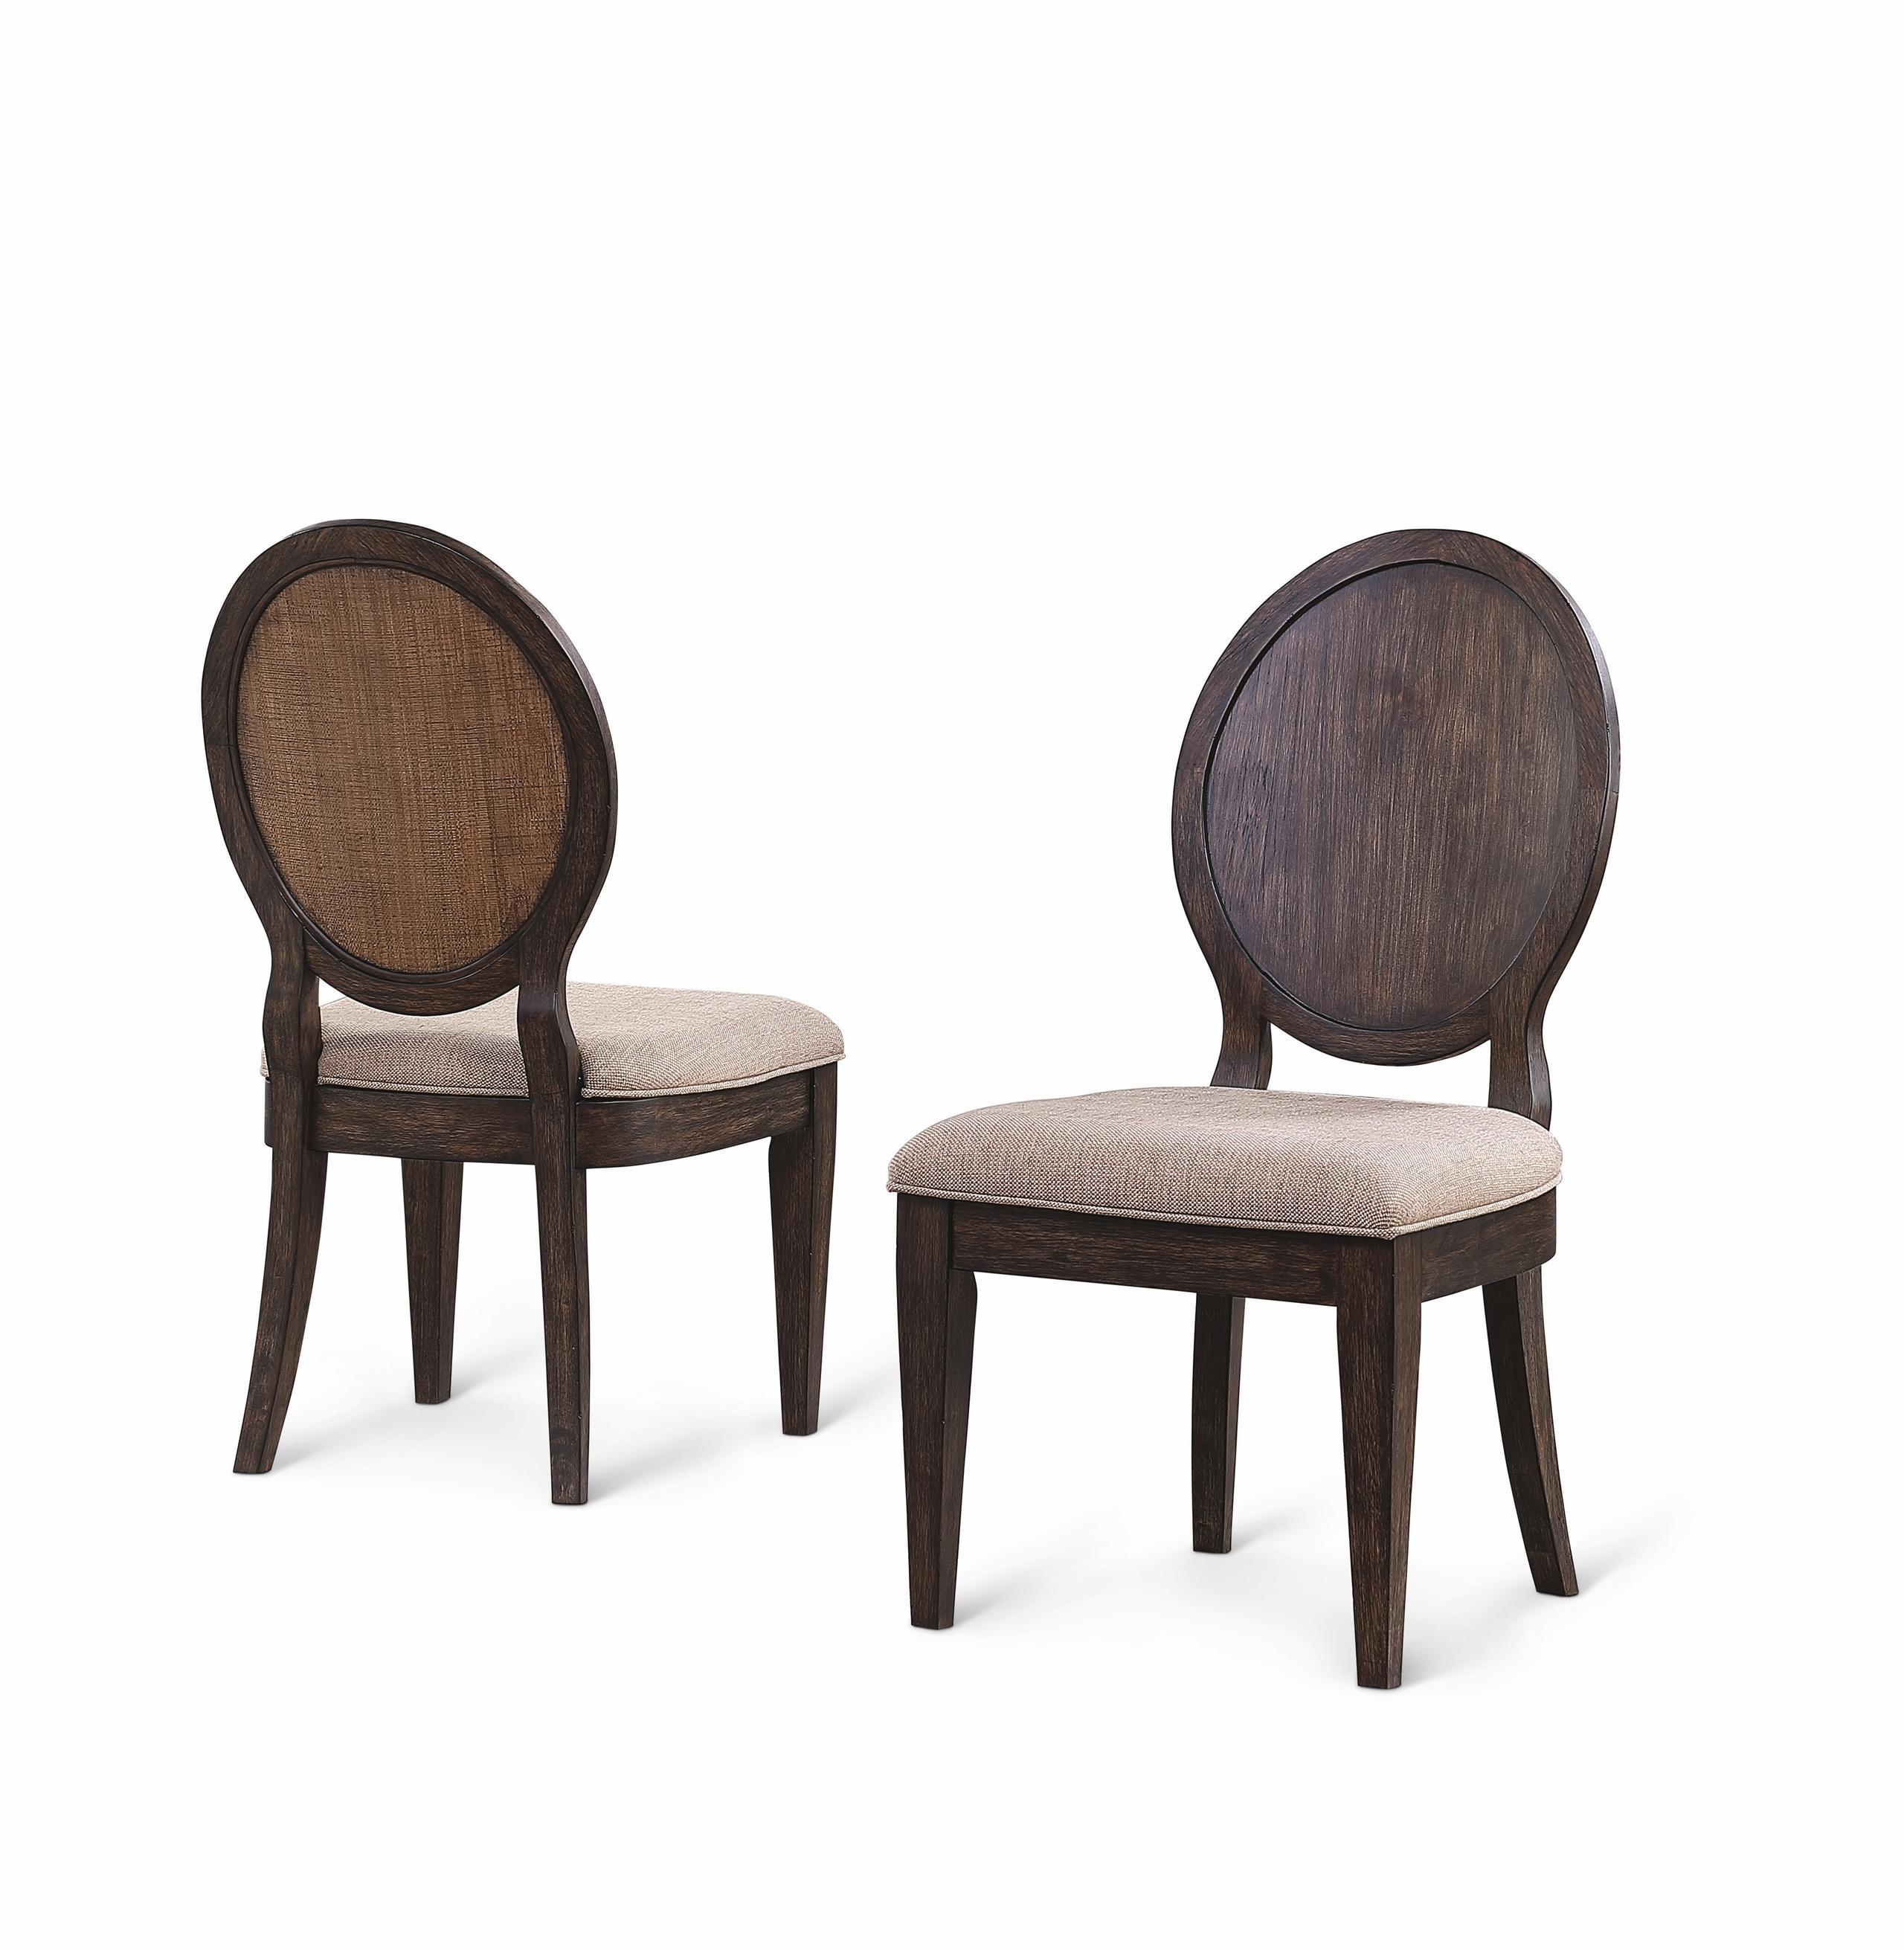 FlexsteelWakefield Dining Chair